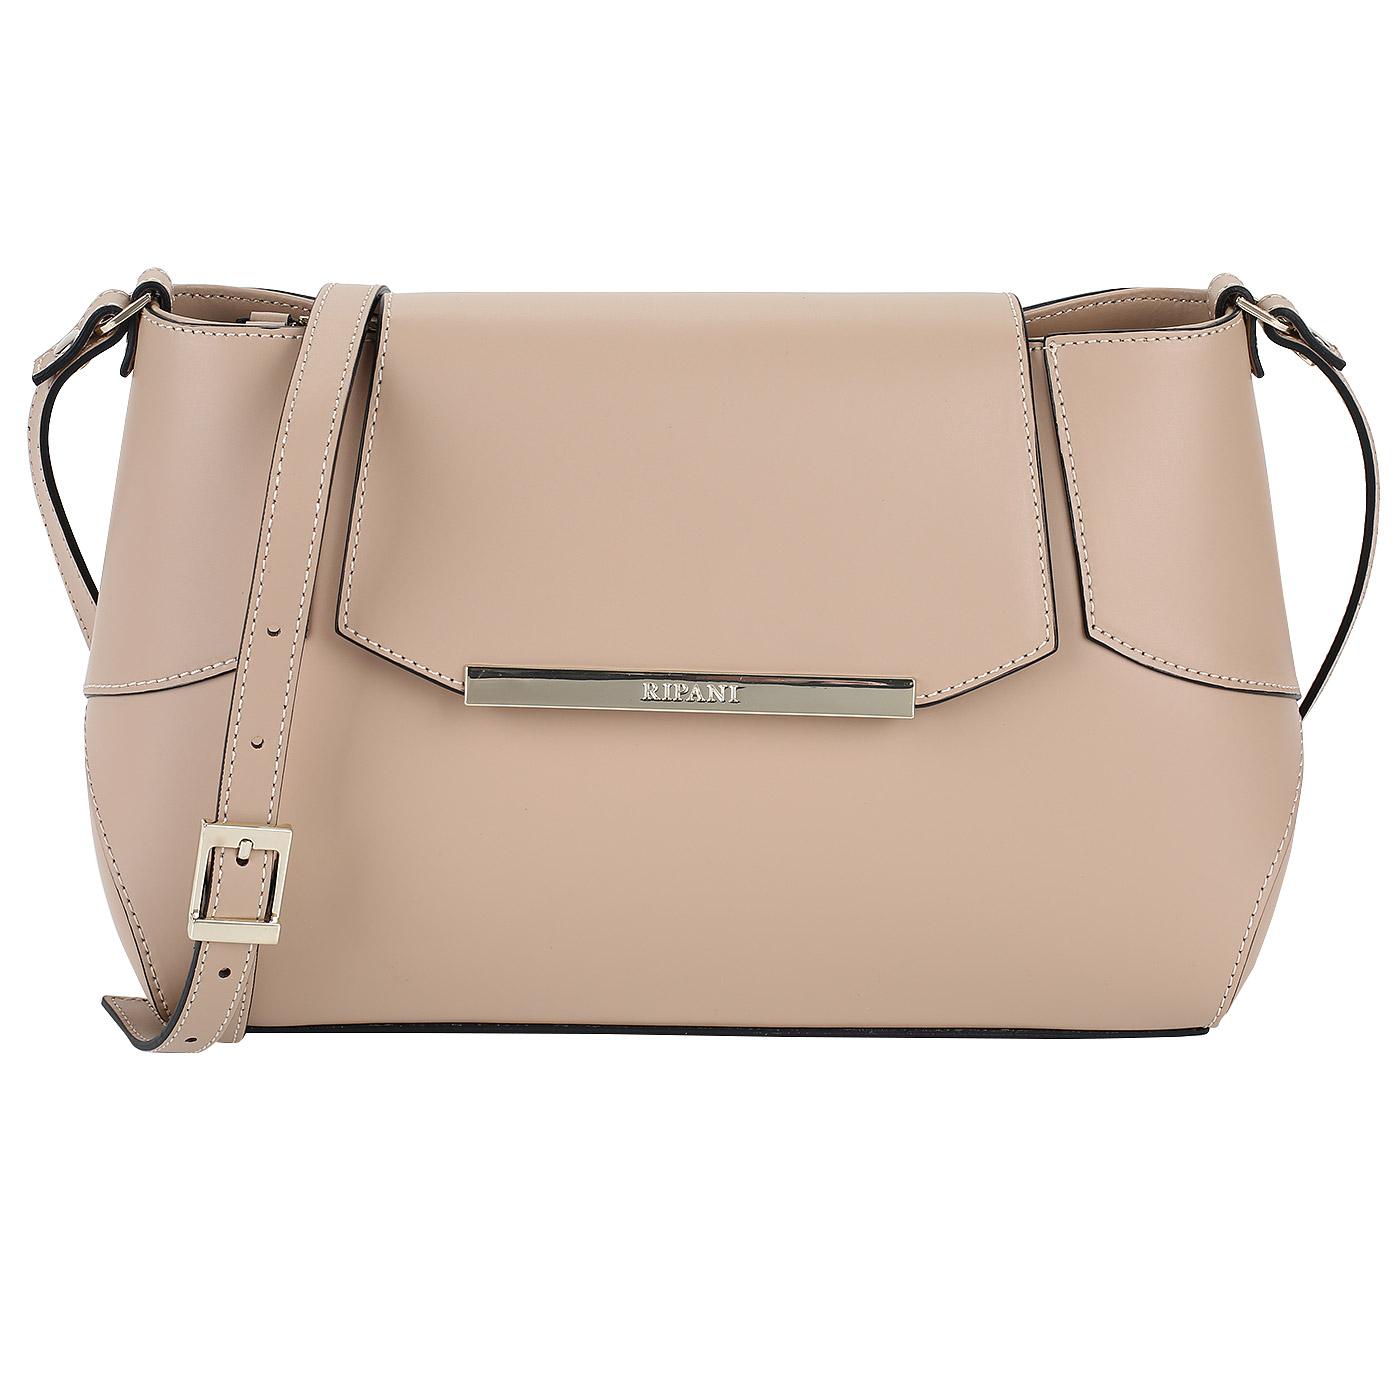 000d6da91f5b Женская бежевая сумка из кожи Ripani Candy 8444HH.00006 ...